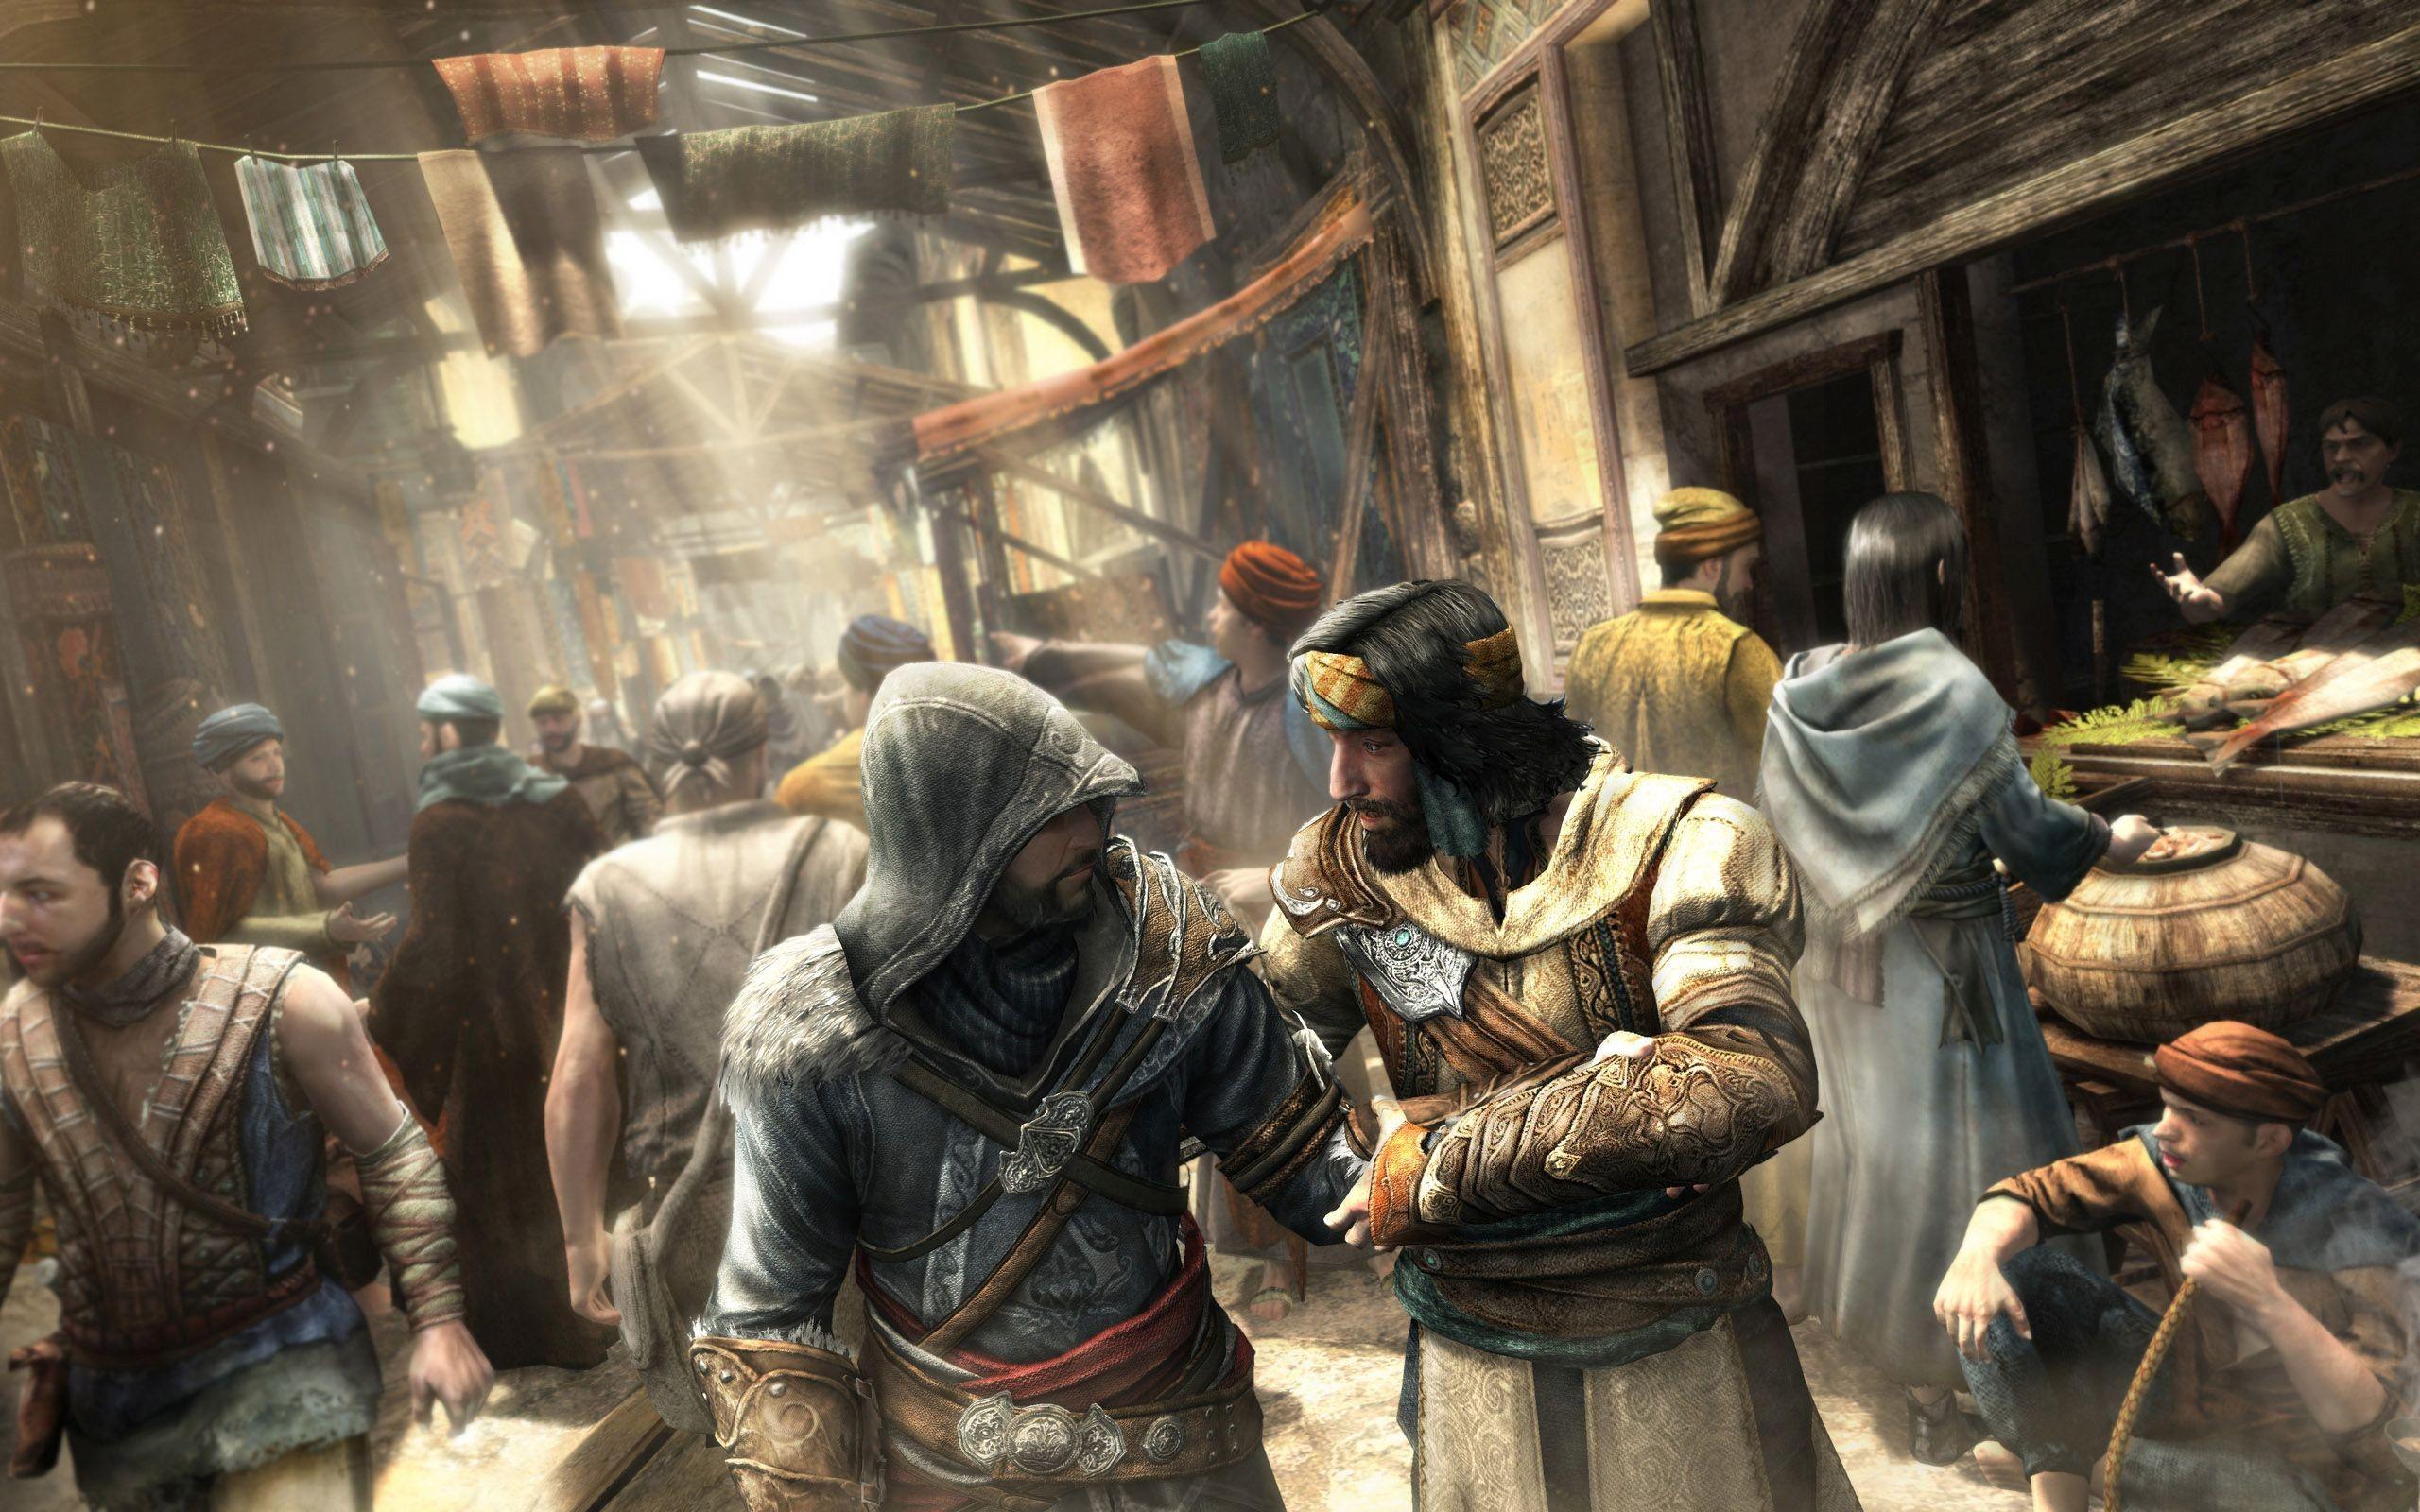 … Assassin's Creed: Revelations HD Wallpaper 2560×1600